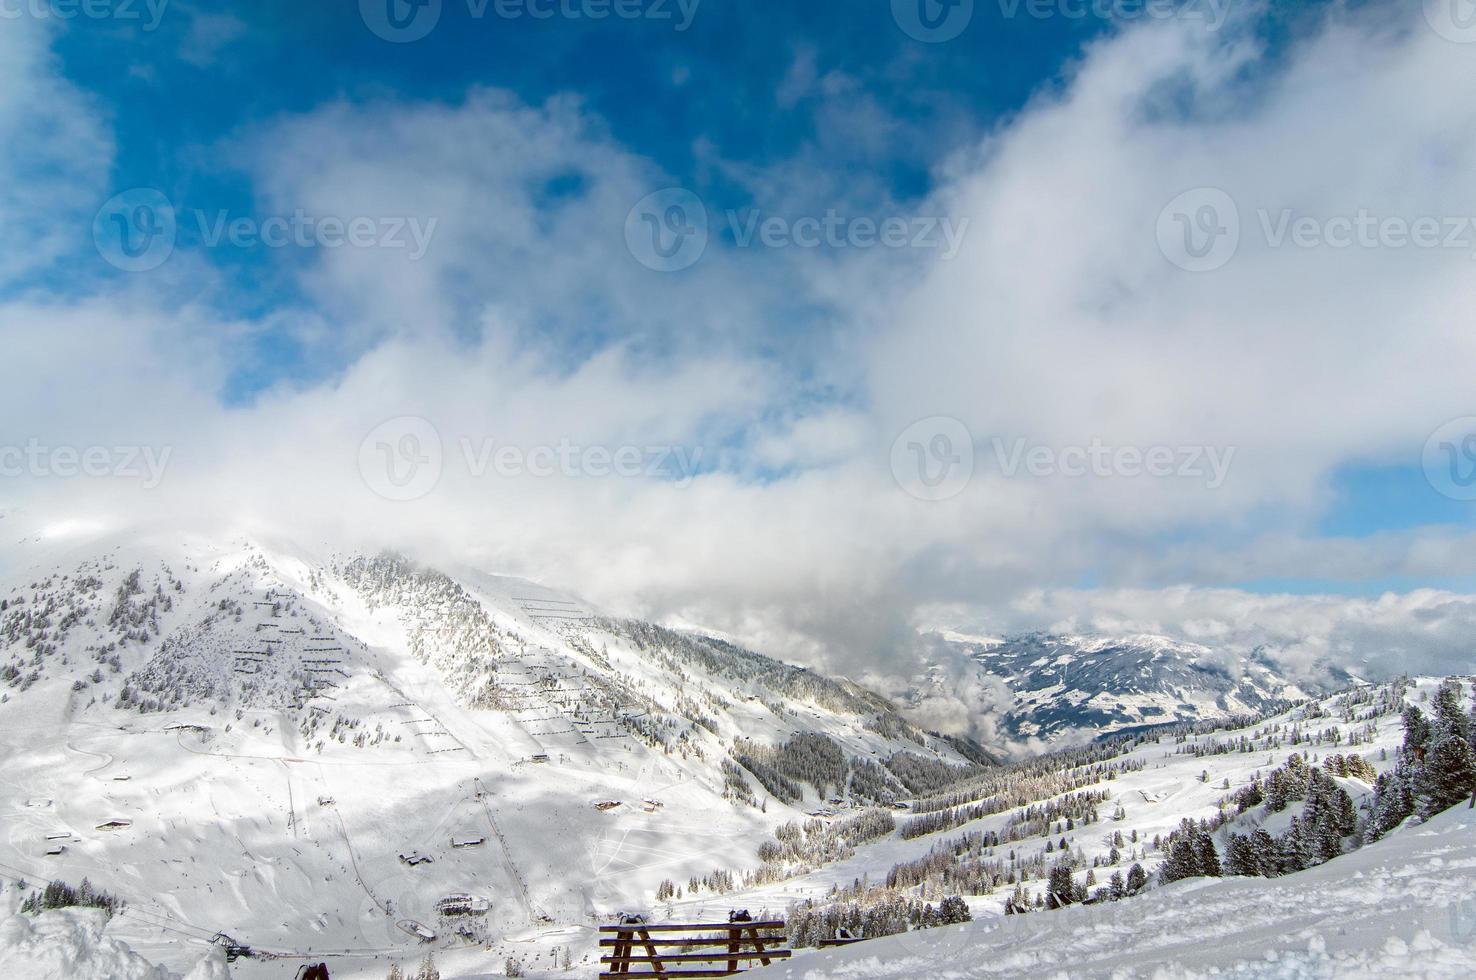 natursköna vinterunderland snöig tapet foto